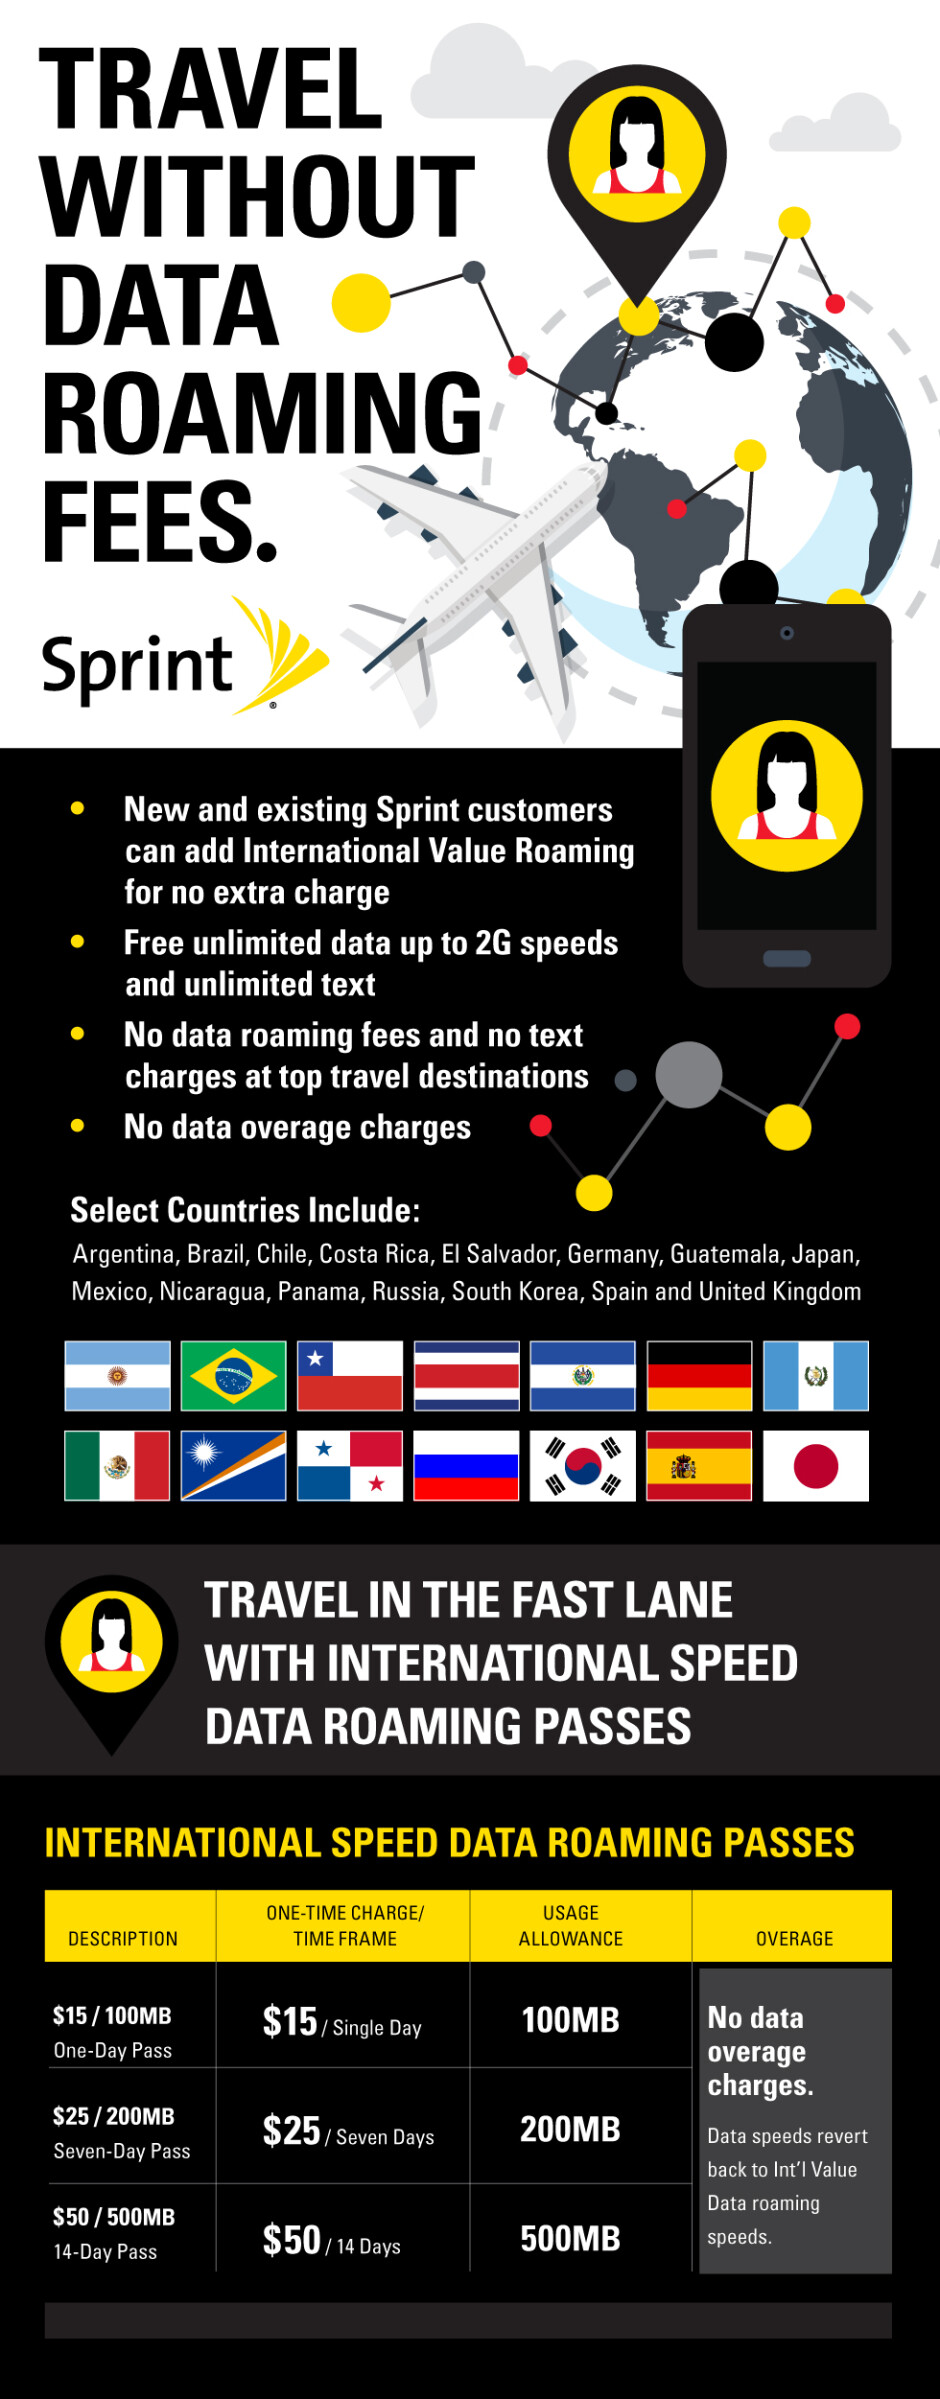 Sprint now offering free international roaming